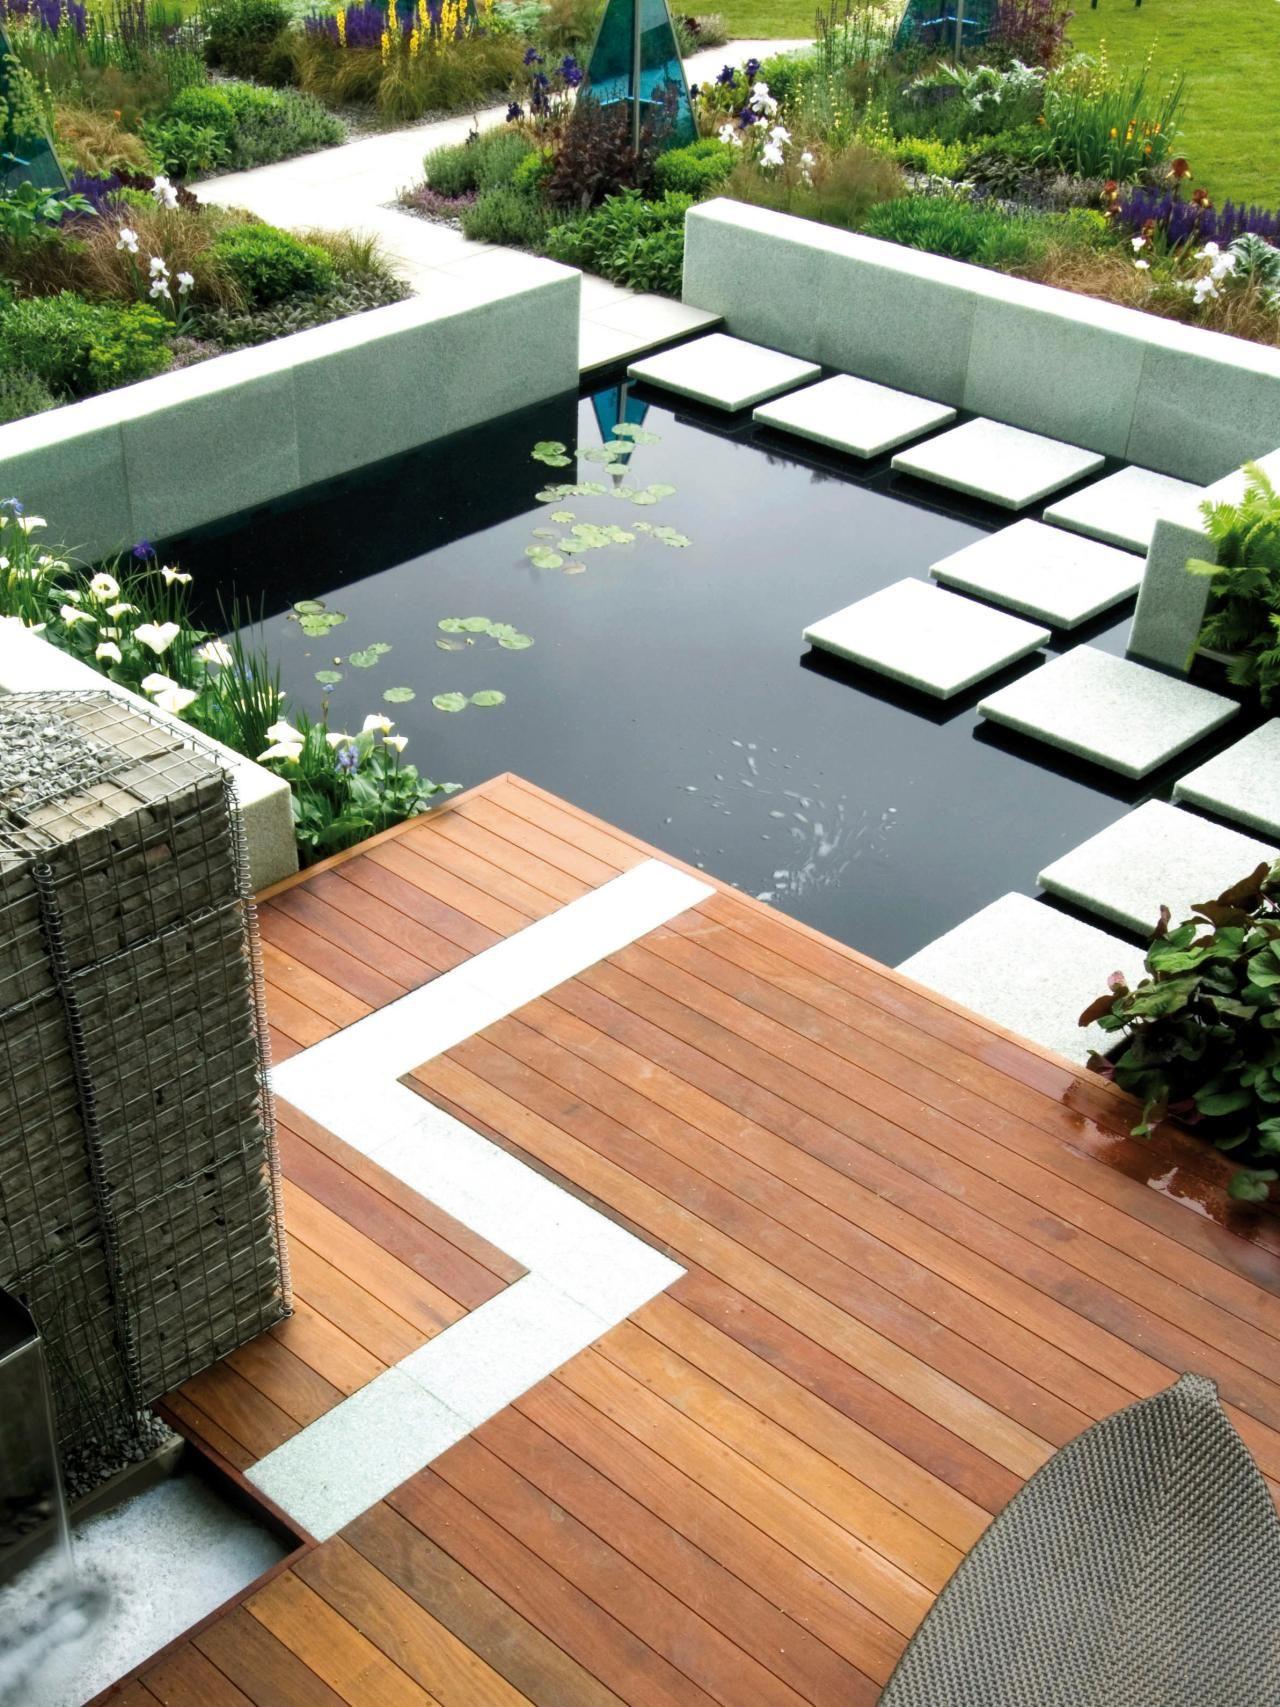 Geometric Designs Create A Bold Landscape In This